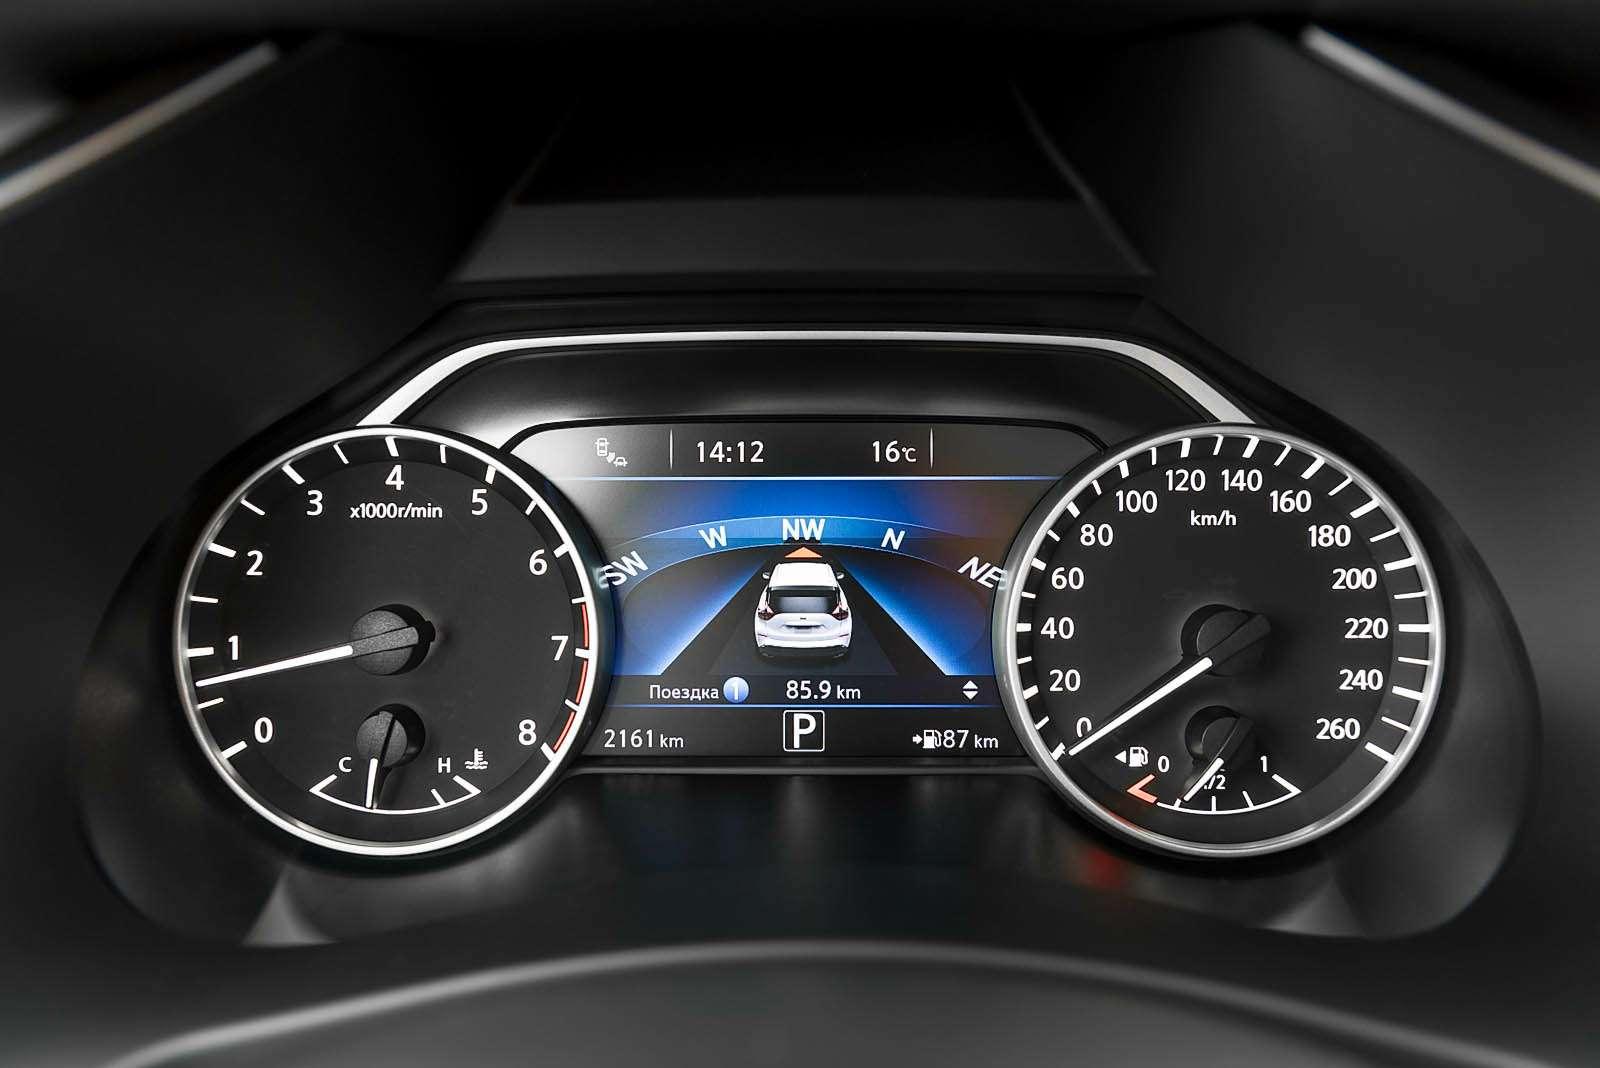 Оператив ЗР: первый тест-драйв кроссовера Nissan Murano— фото 610740